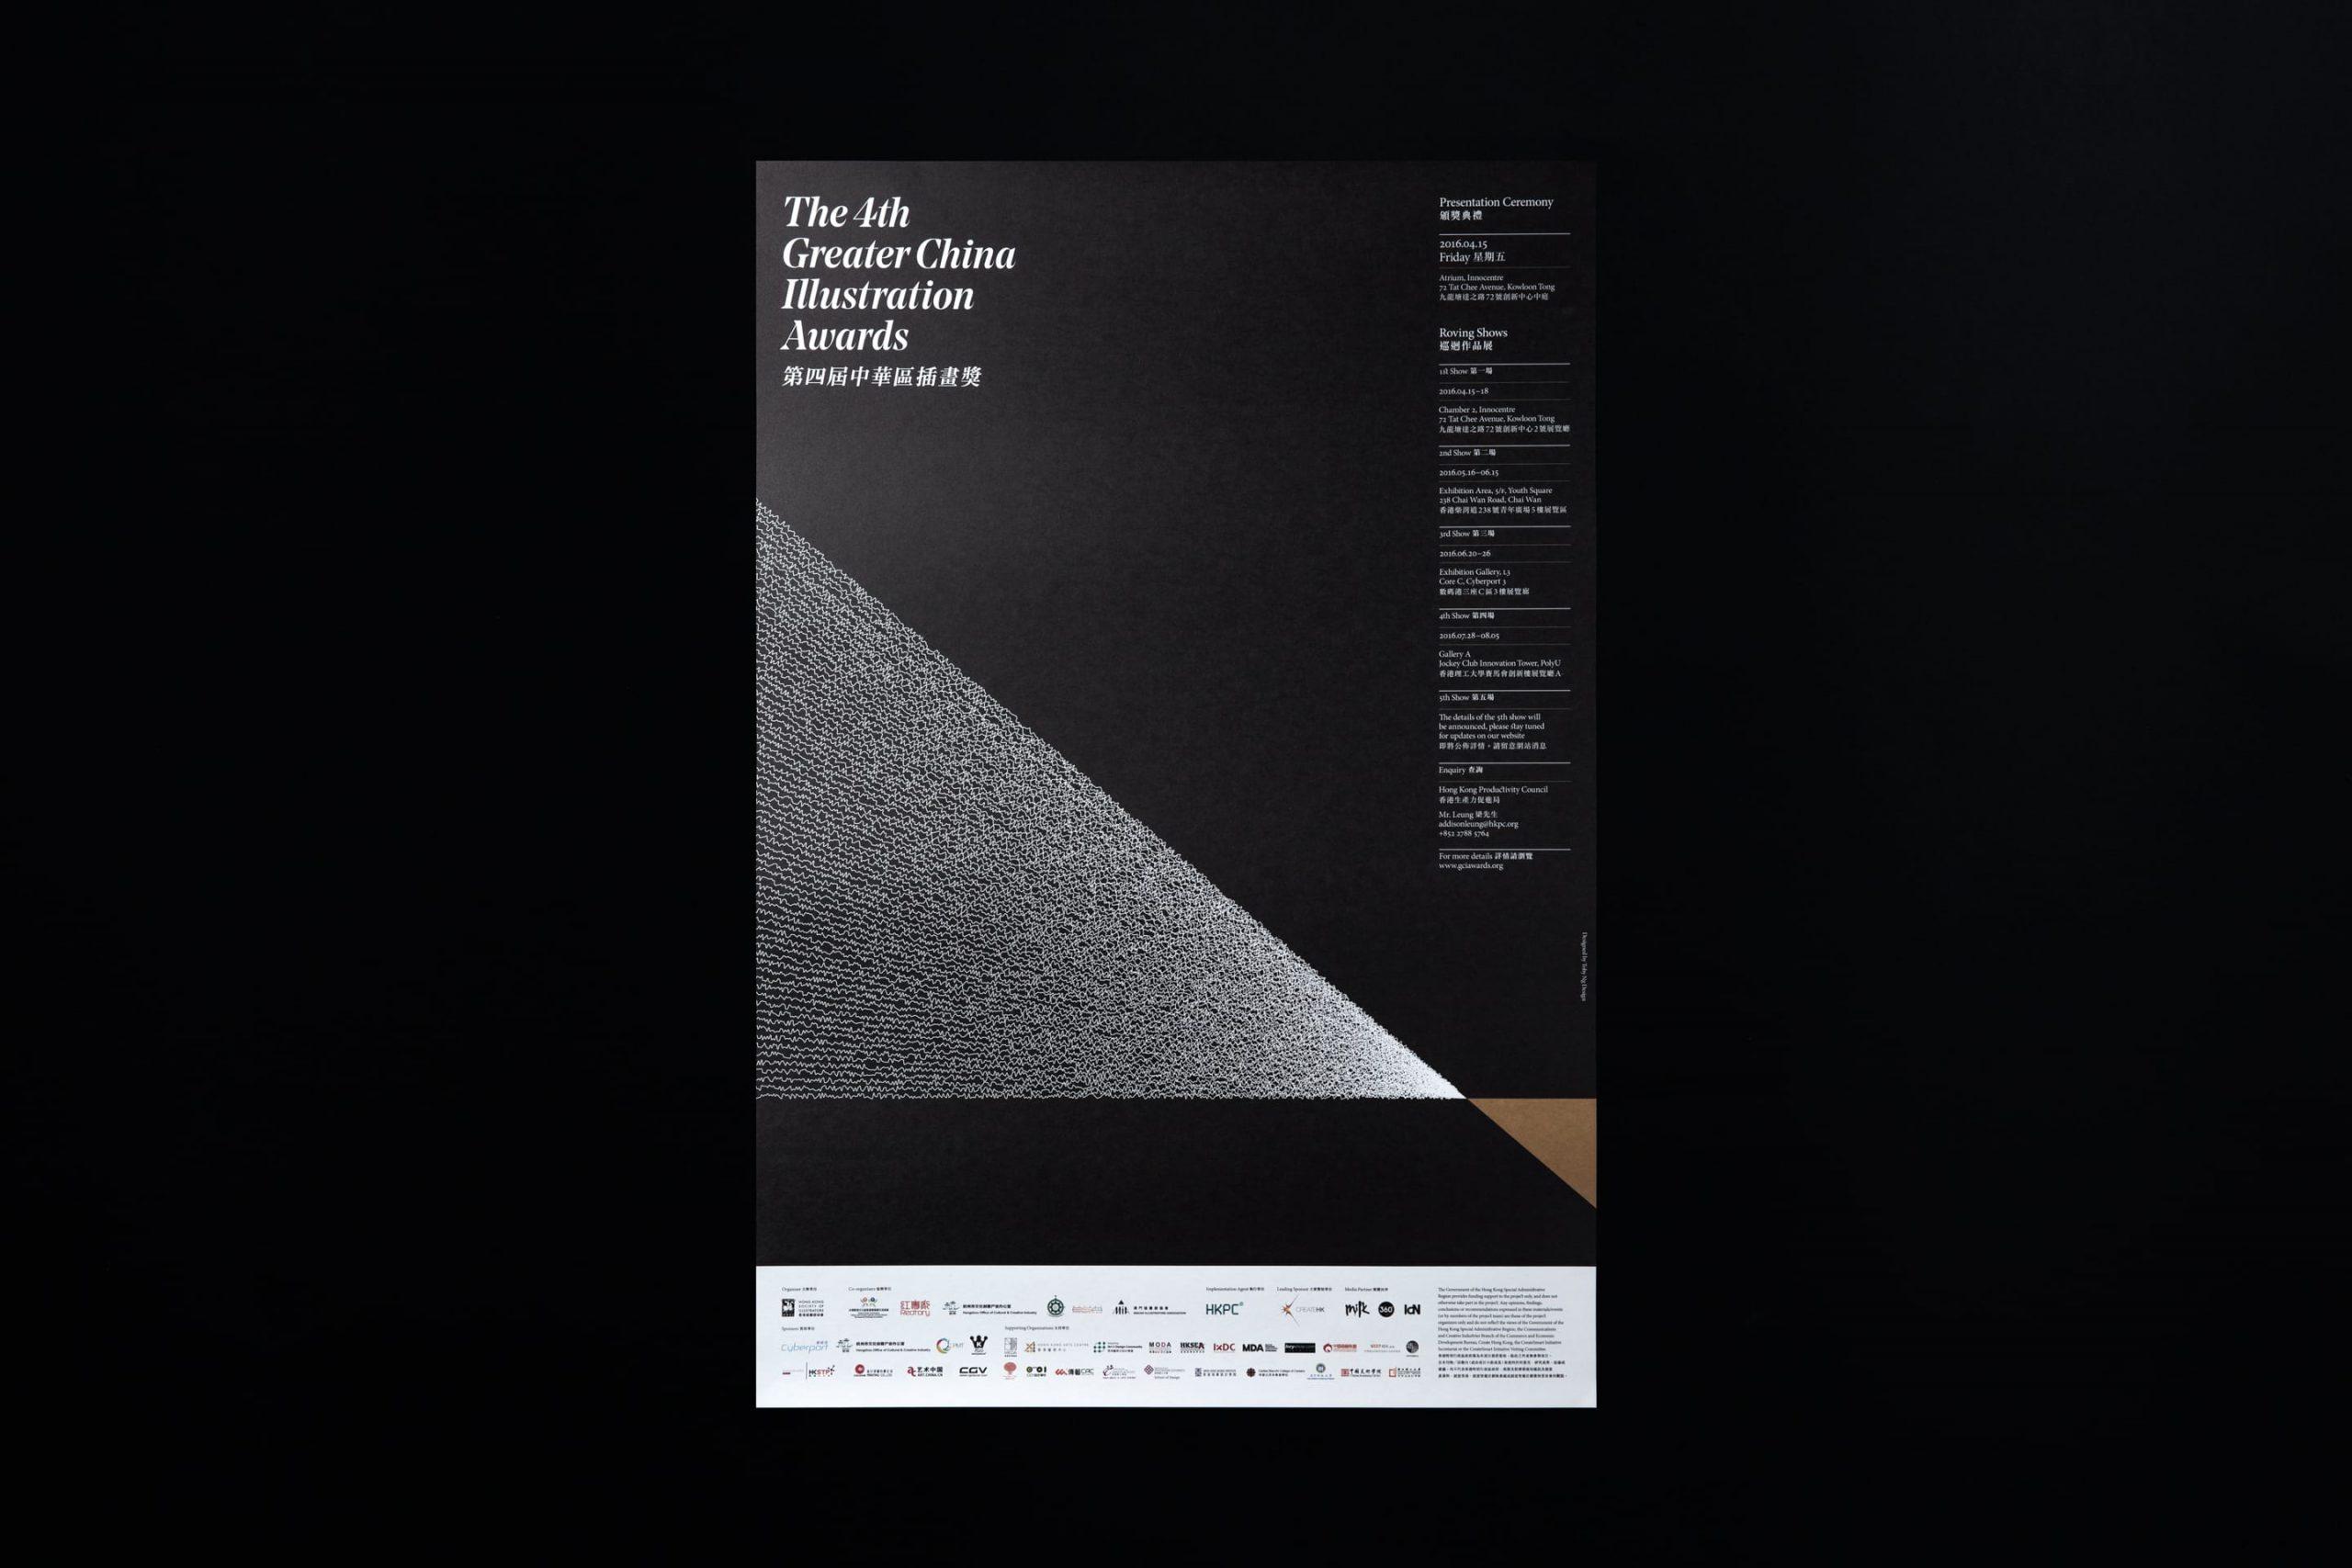 4th-greater-china-illustration-awards_18